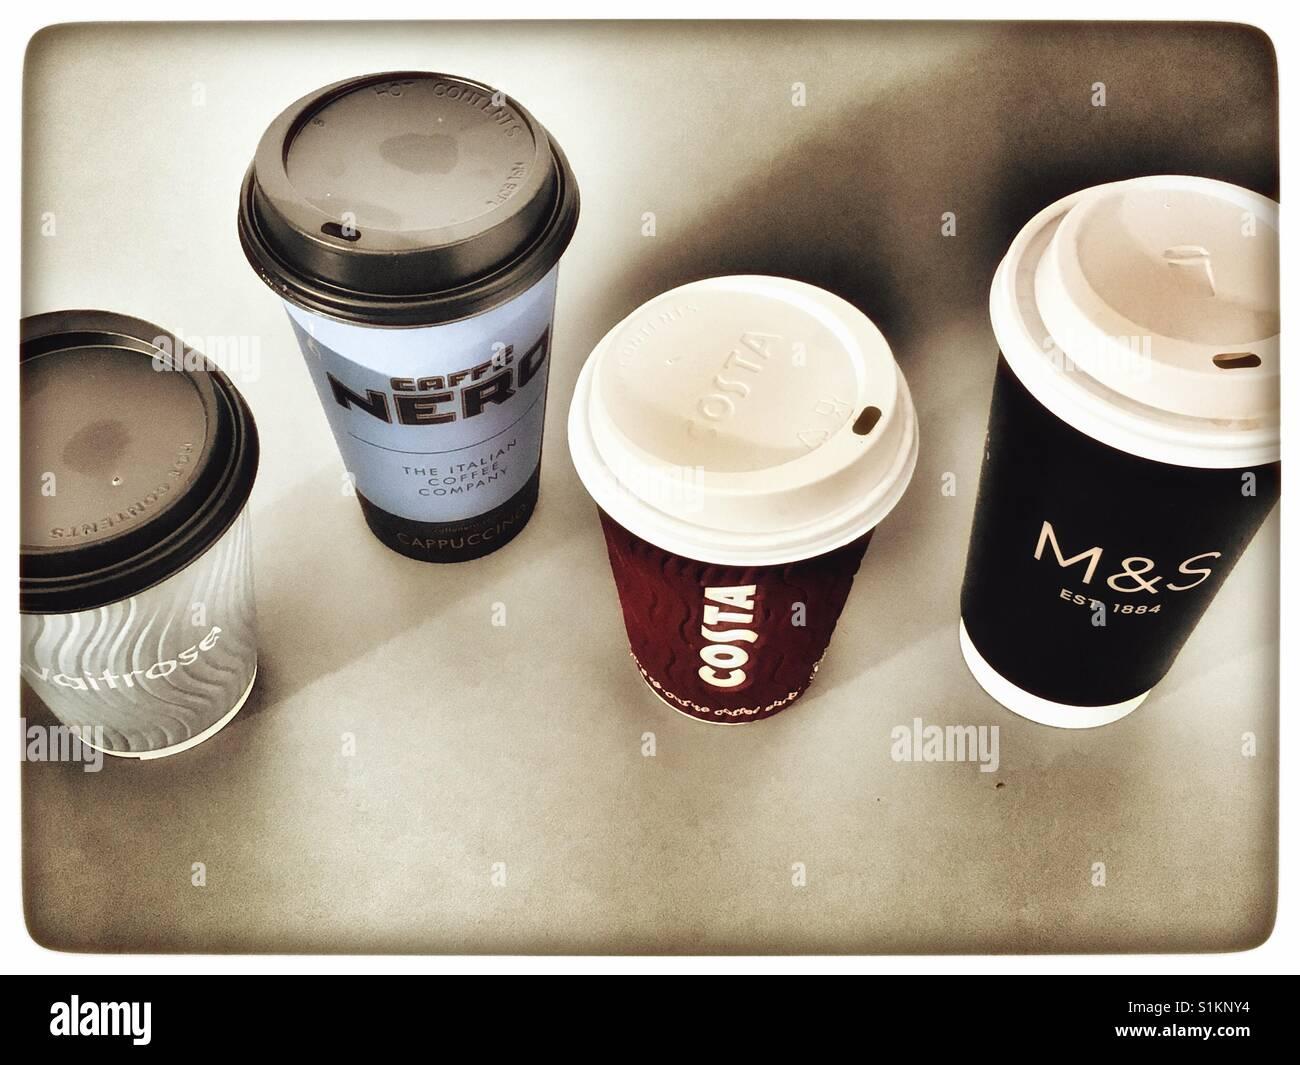 Take away coffee cups - Stock Image